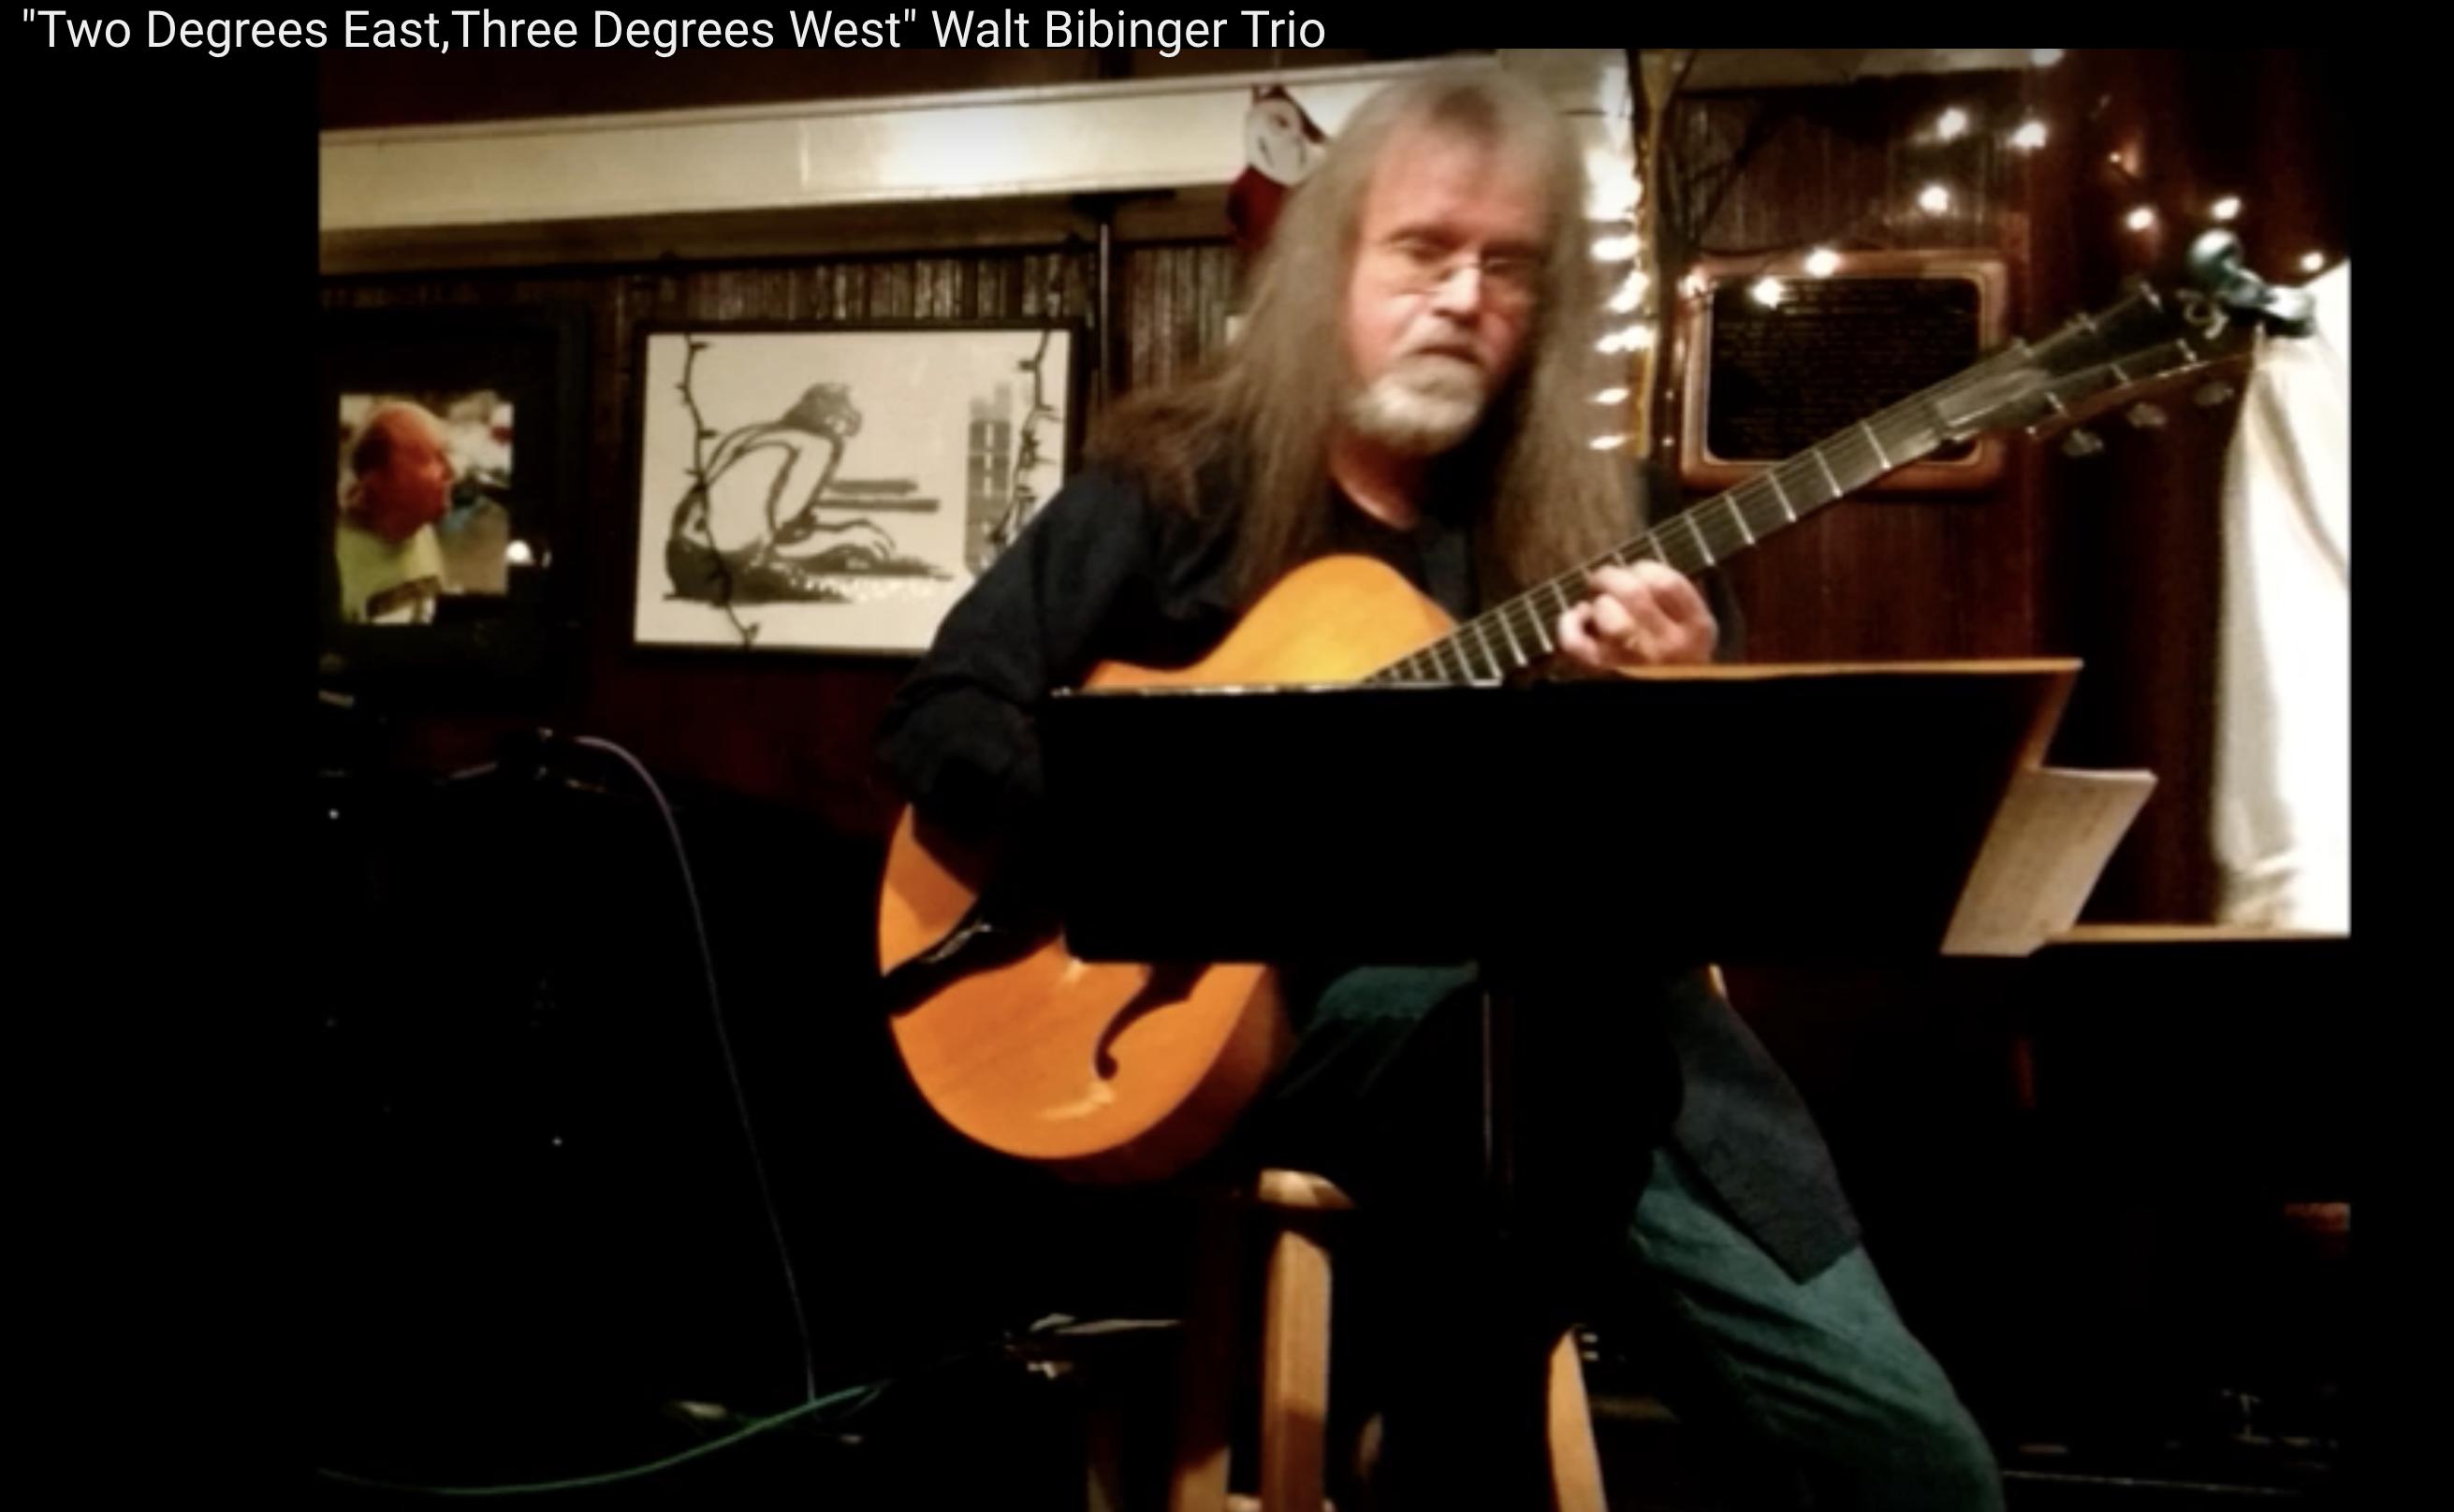 Walt Bibinger Trio